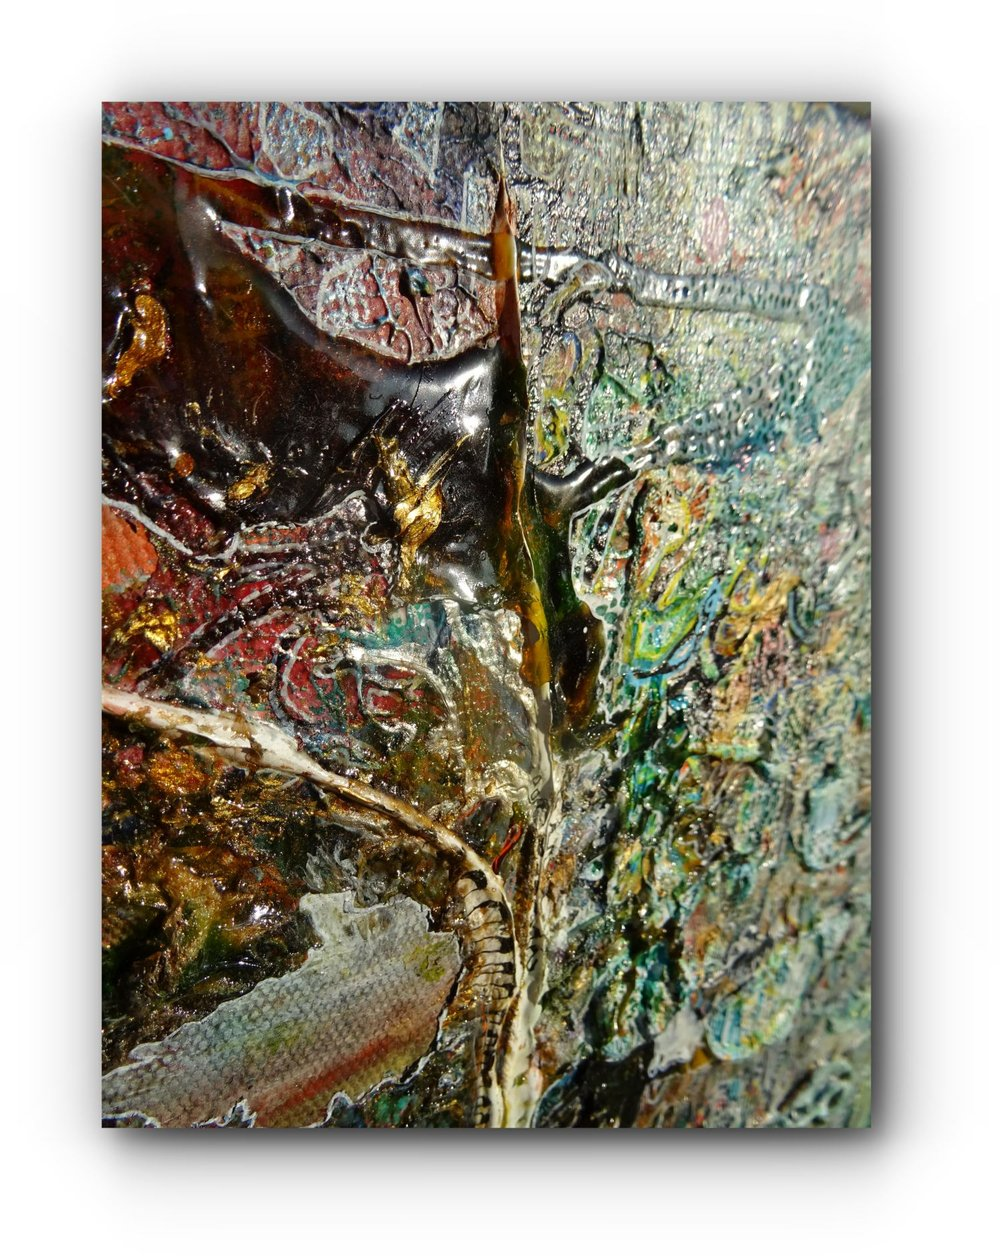 painting-detail-4-birds-eye-view-ingress-vortices.jpg